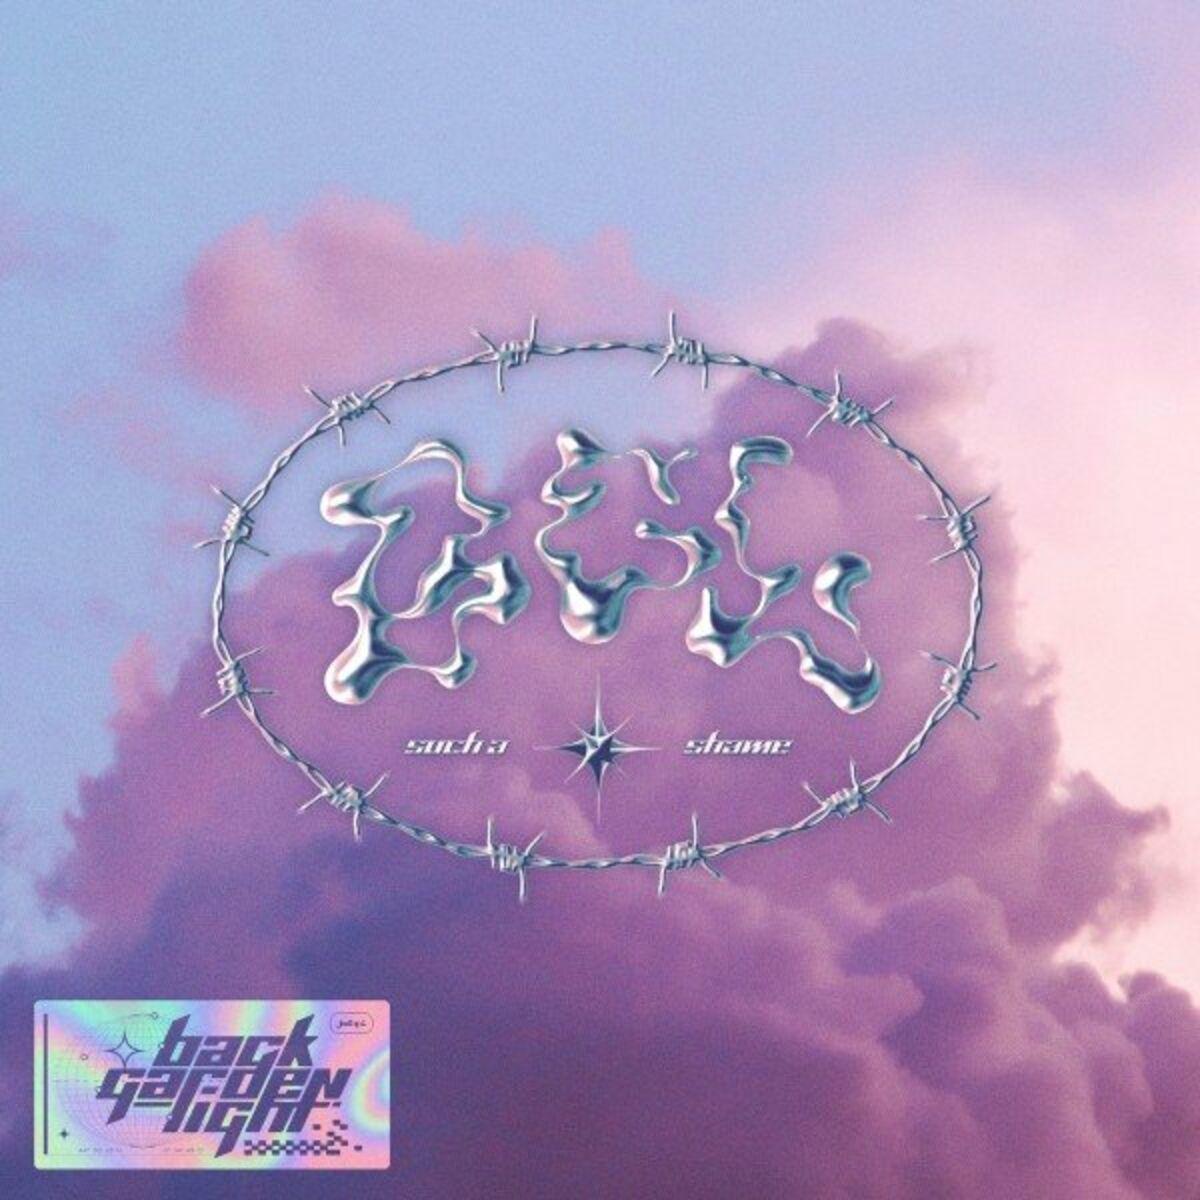 Back Garden Light - Such a Shame [single] (2021)